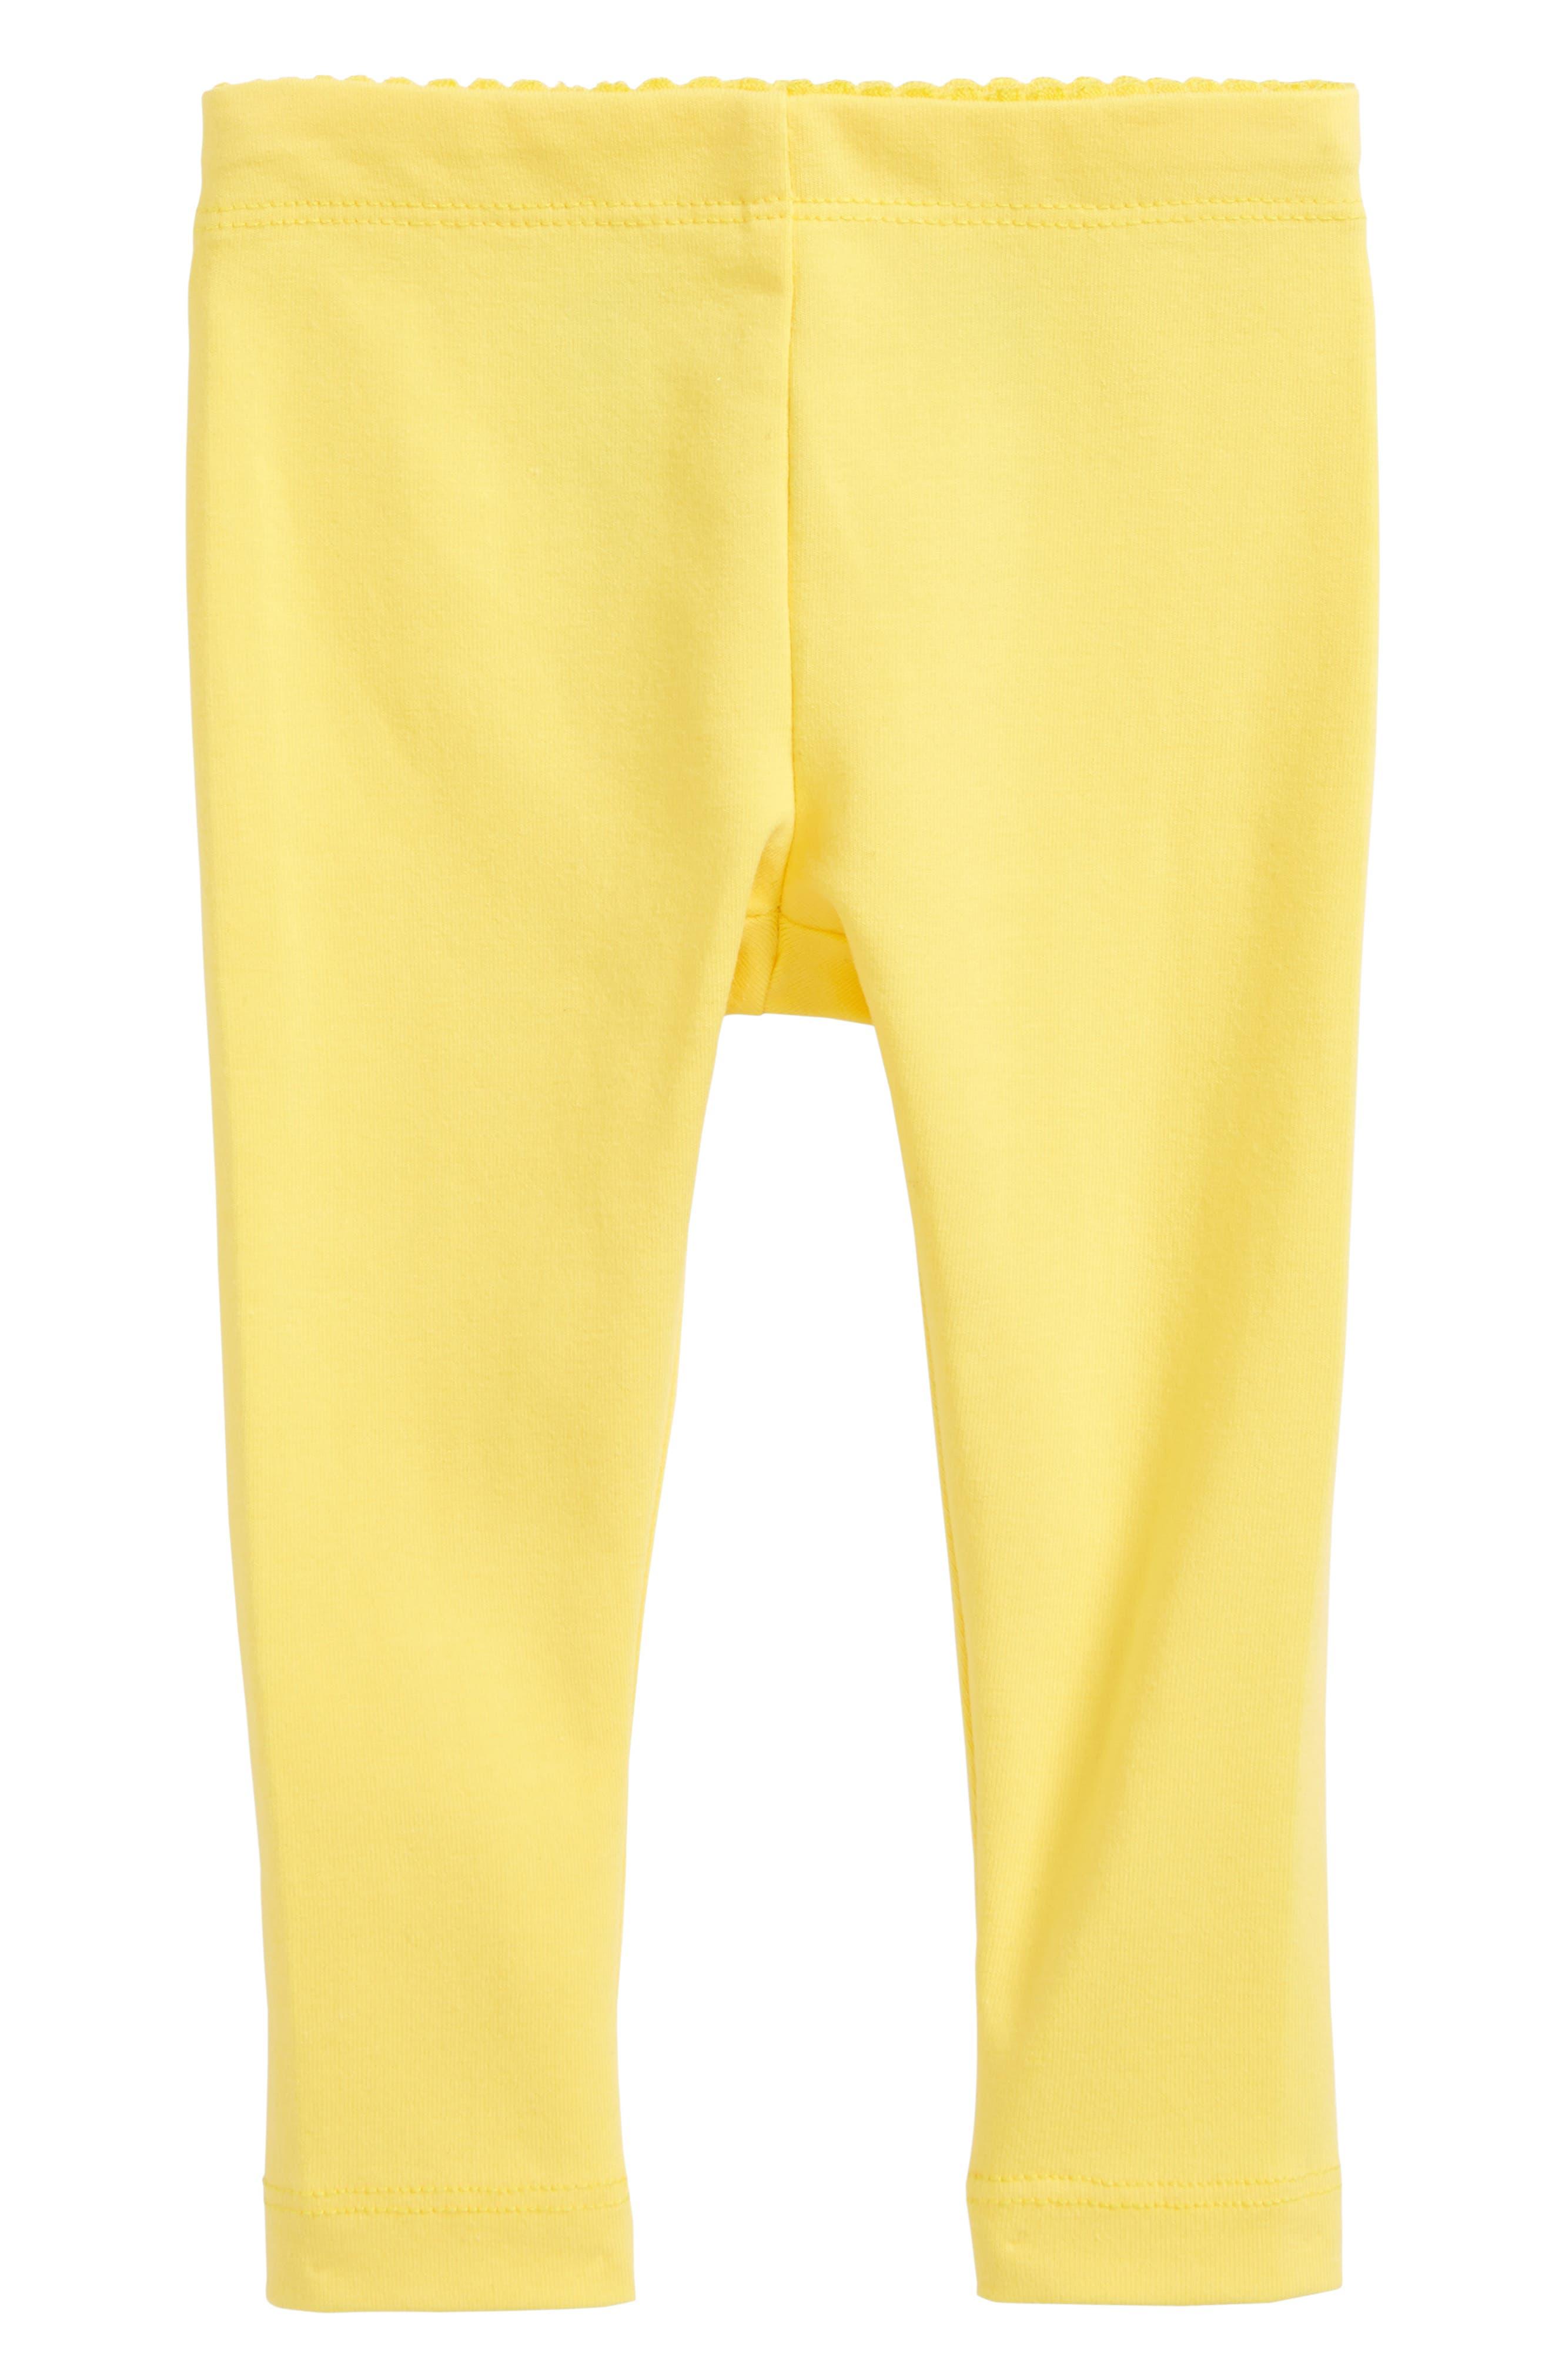 Solid Leggings,                             Main thumbnail 1, color,                             Daffodil